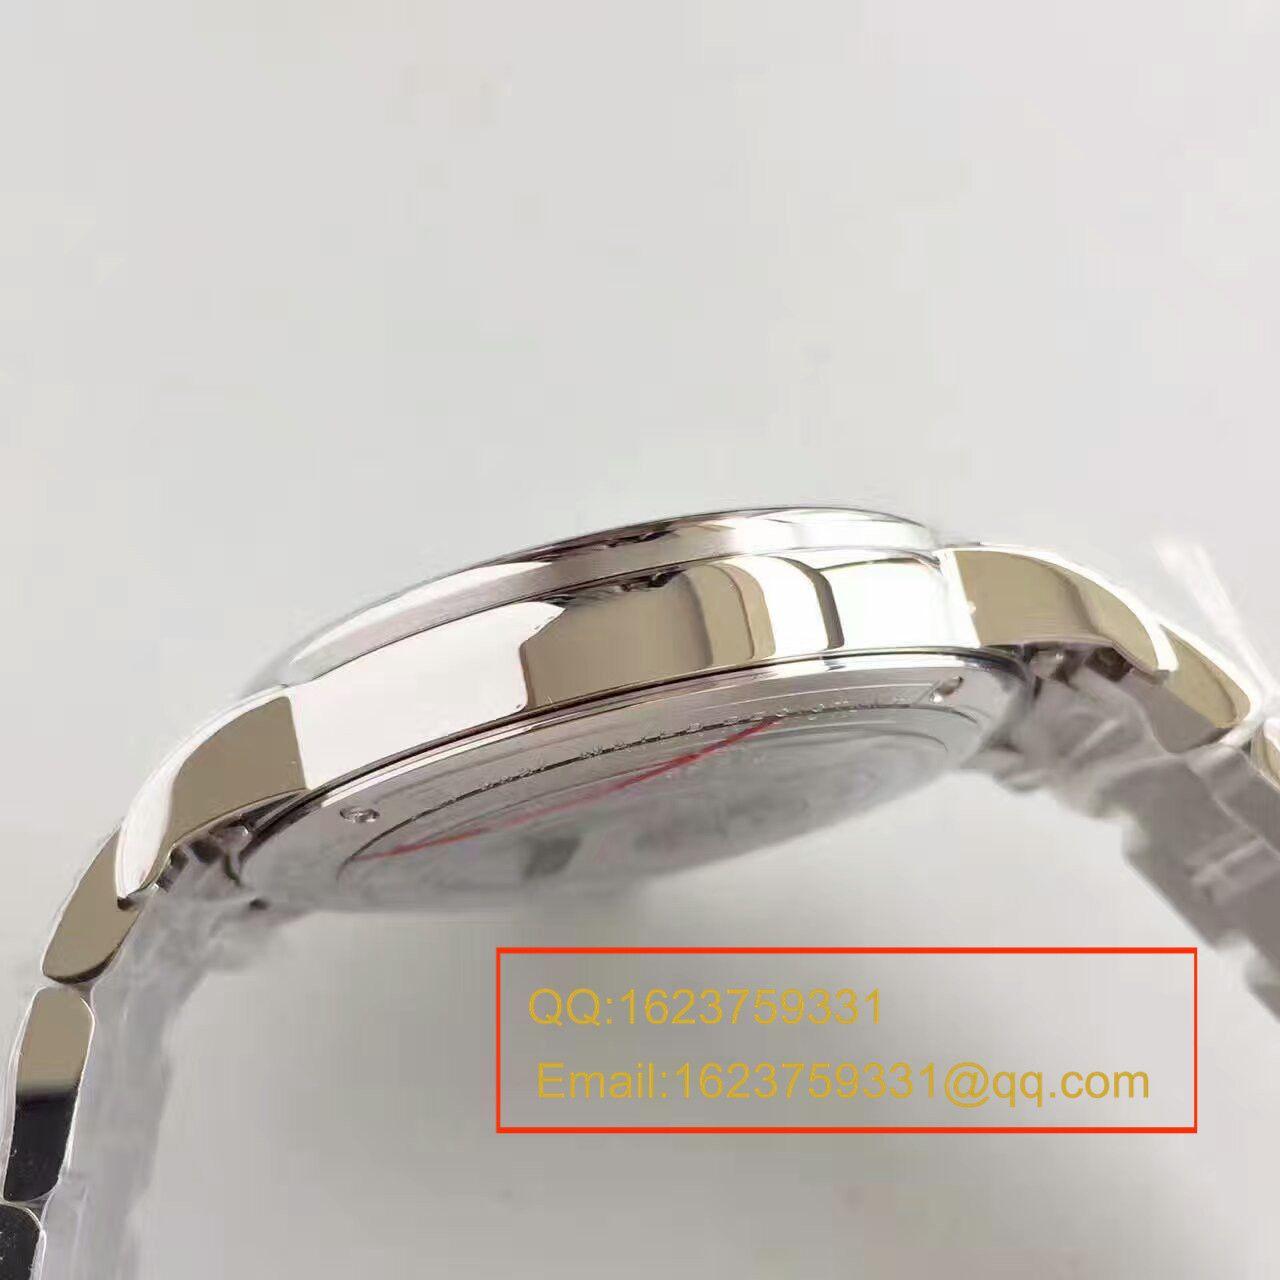 【VF厂1:1精仿复刻手表】万宝龙明星4810系列U0114854腕表 / MB007